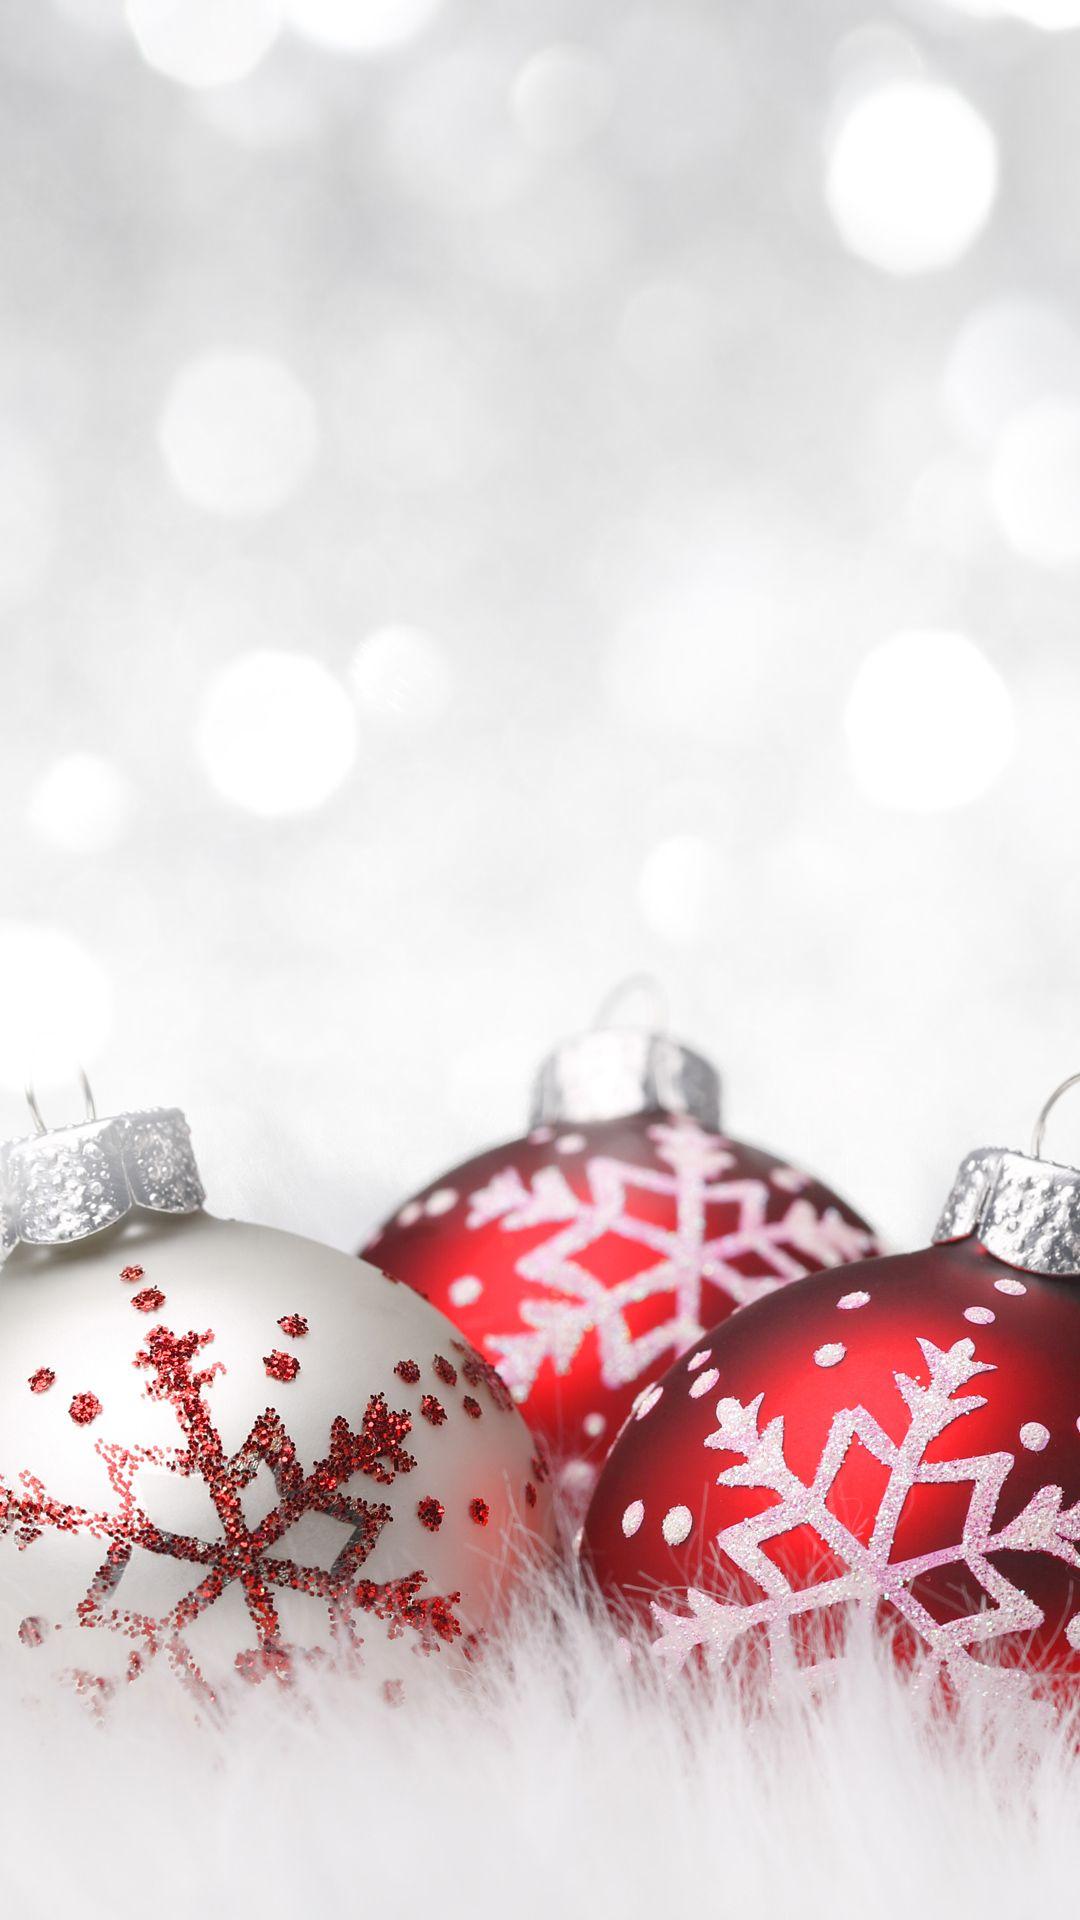 Xmas Smartphonewallpapers Christmas Tree Wallpaper Iphone Christmas Phone Wallpaper Christmas Wallpaper